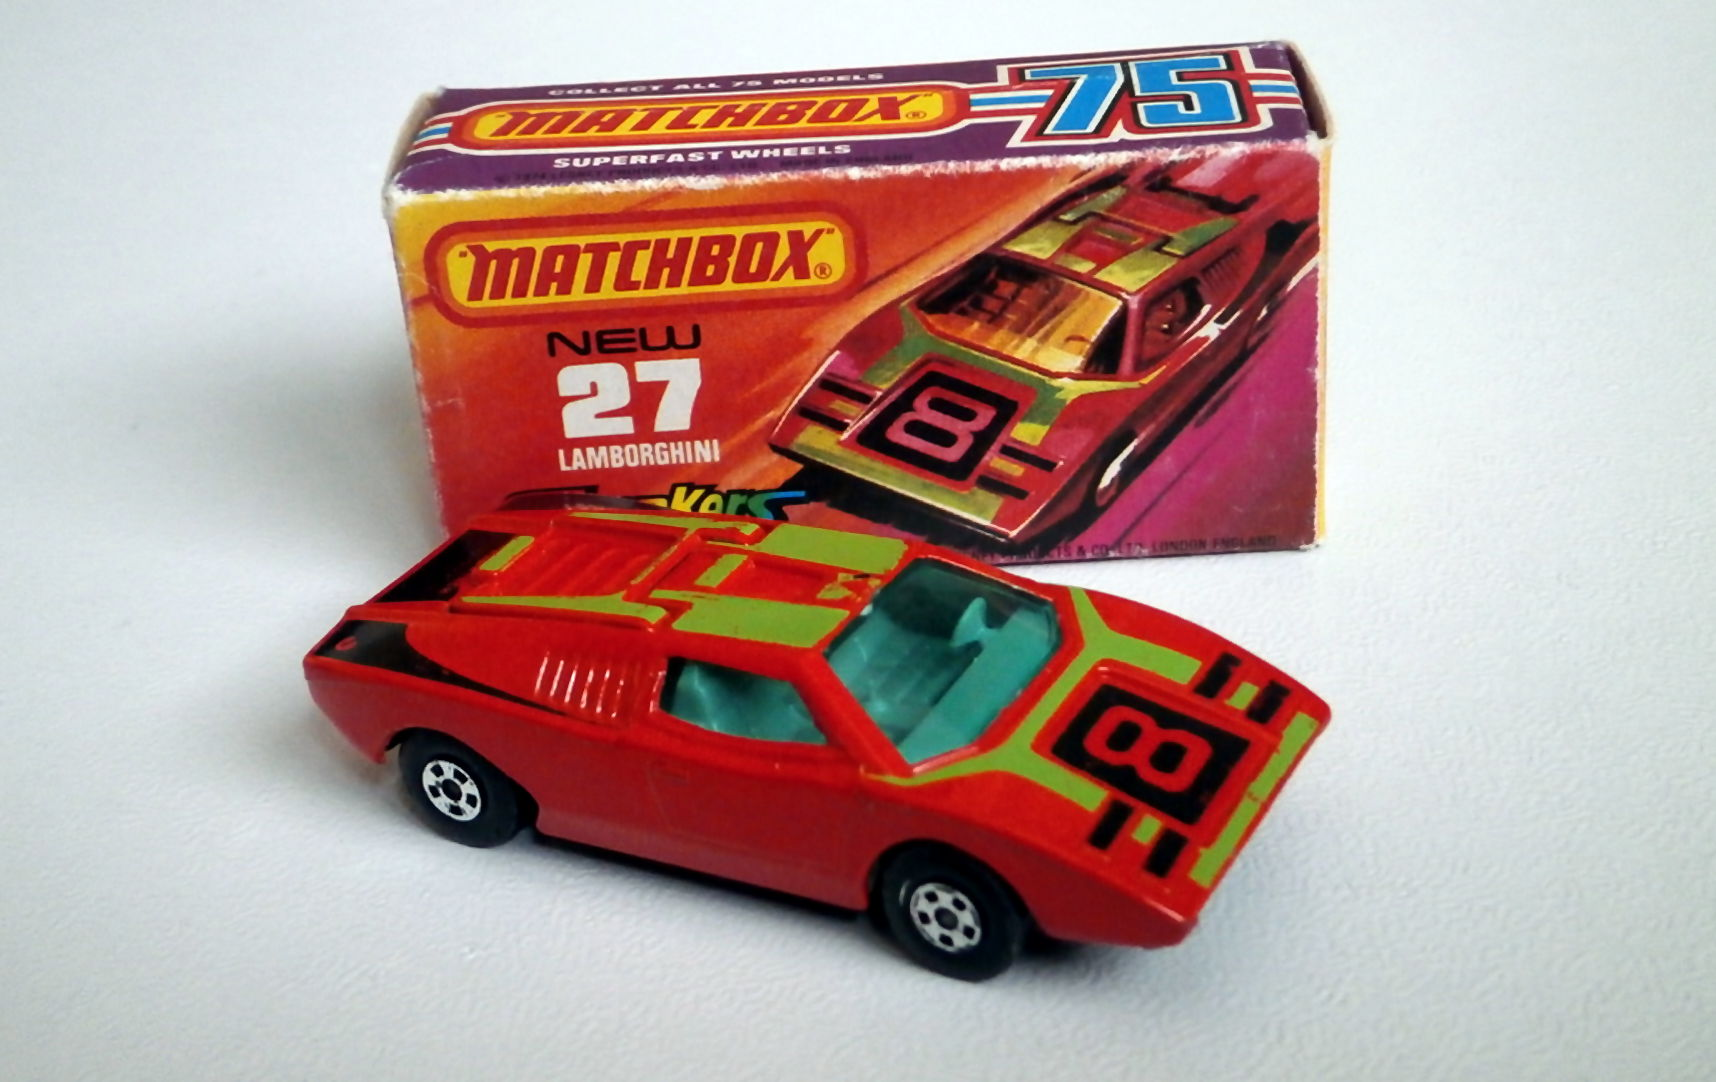 Lamborghini Countach 1973 Matchbox Cars Wiki Fandom Powered By